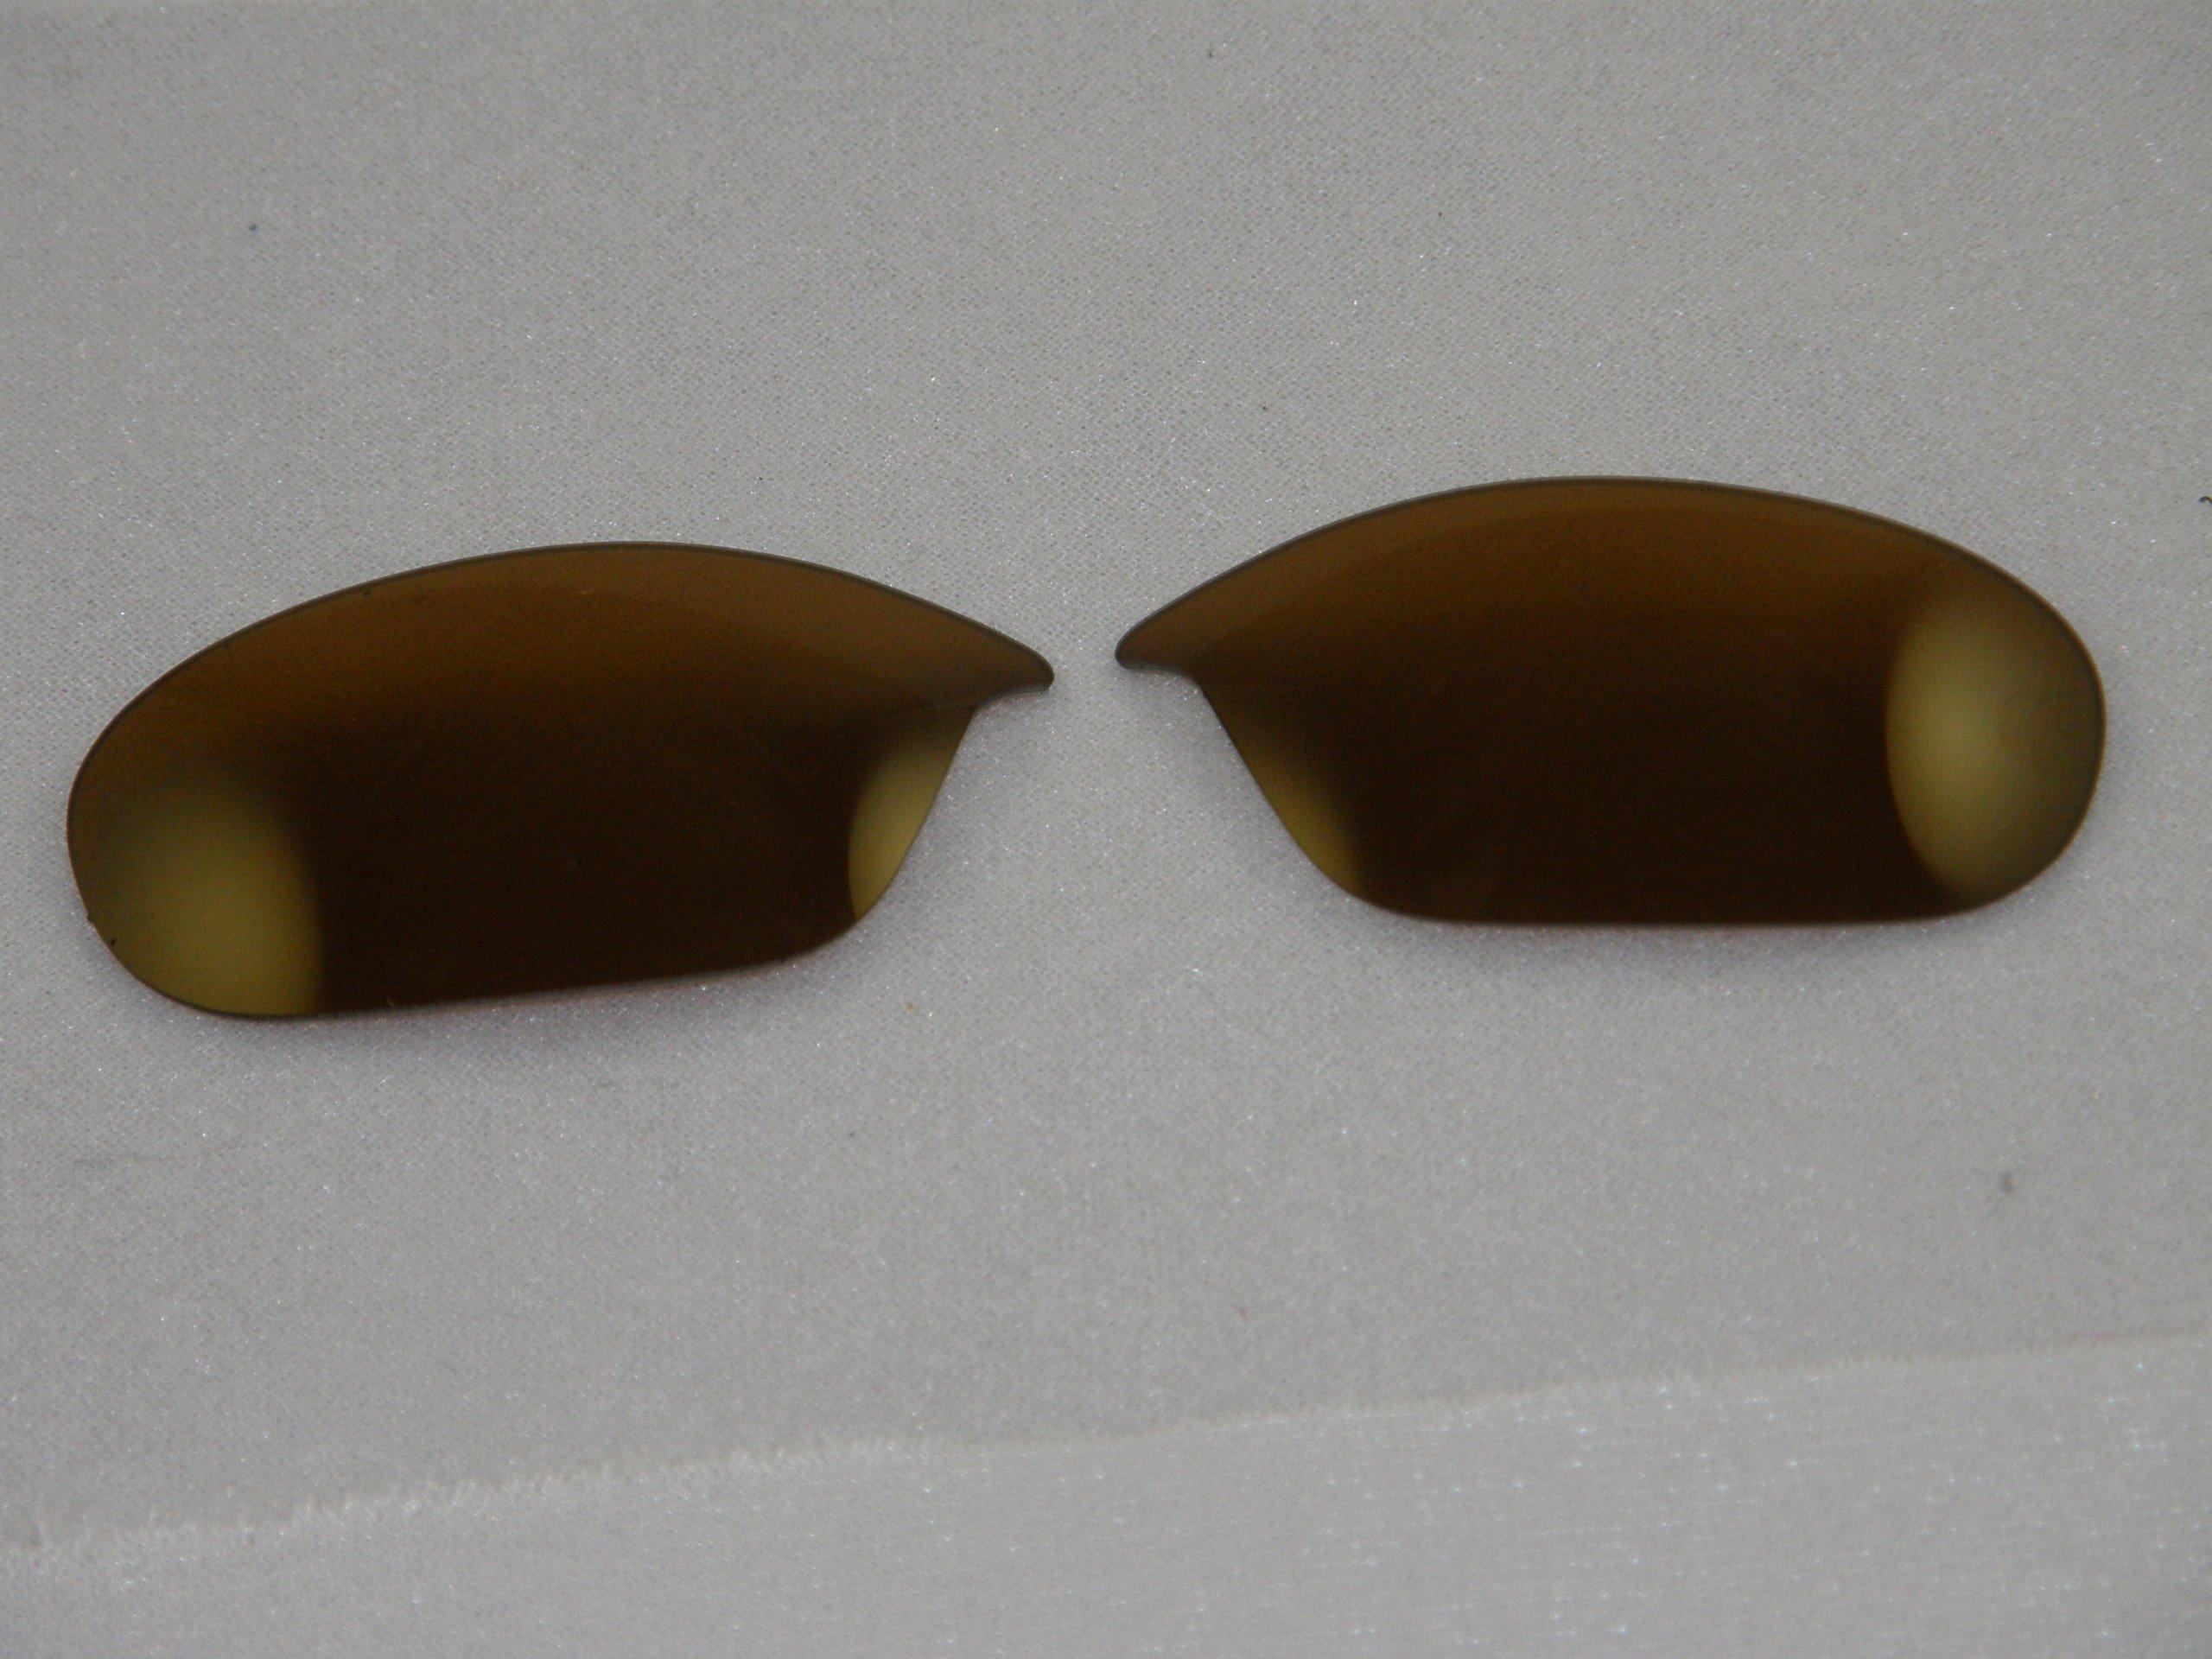 Native Eyewear Throttle Lens Kit, Polarized Bronze Reflex by Native Eyewear